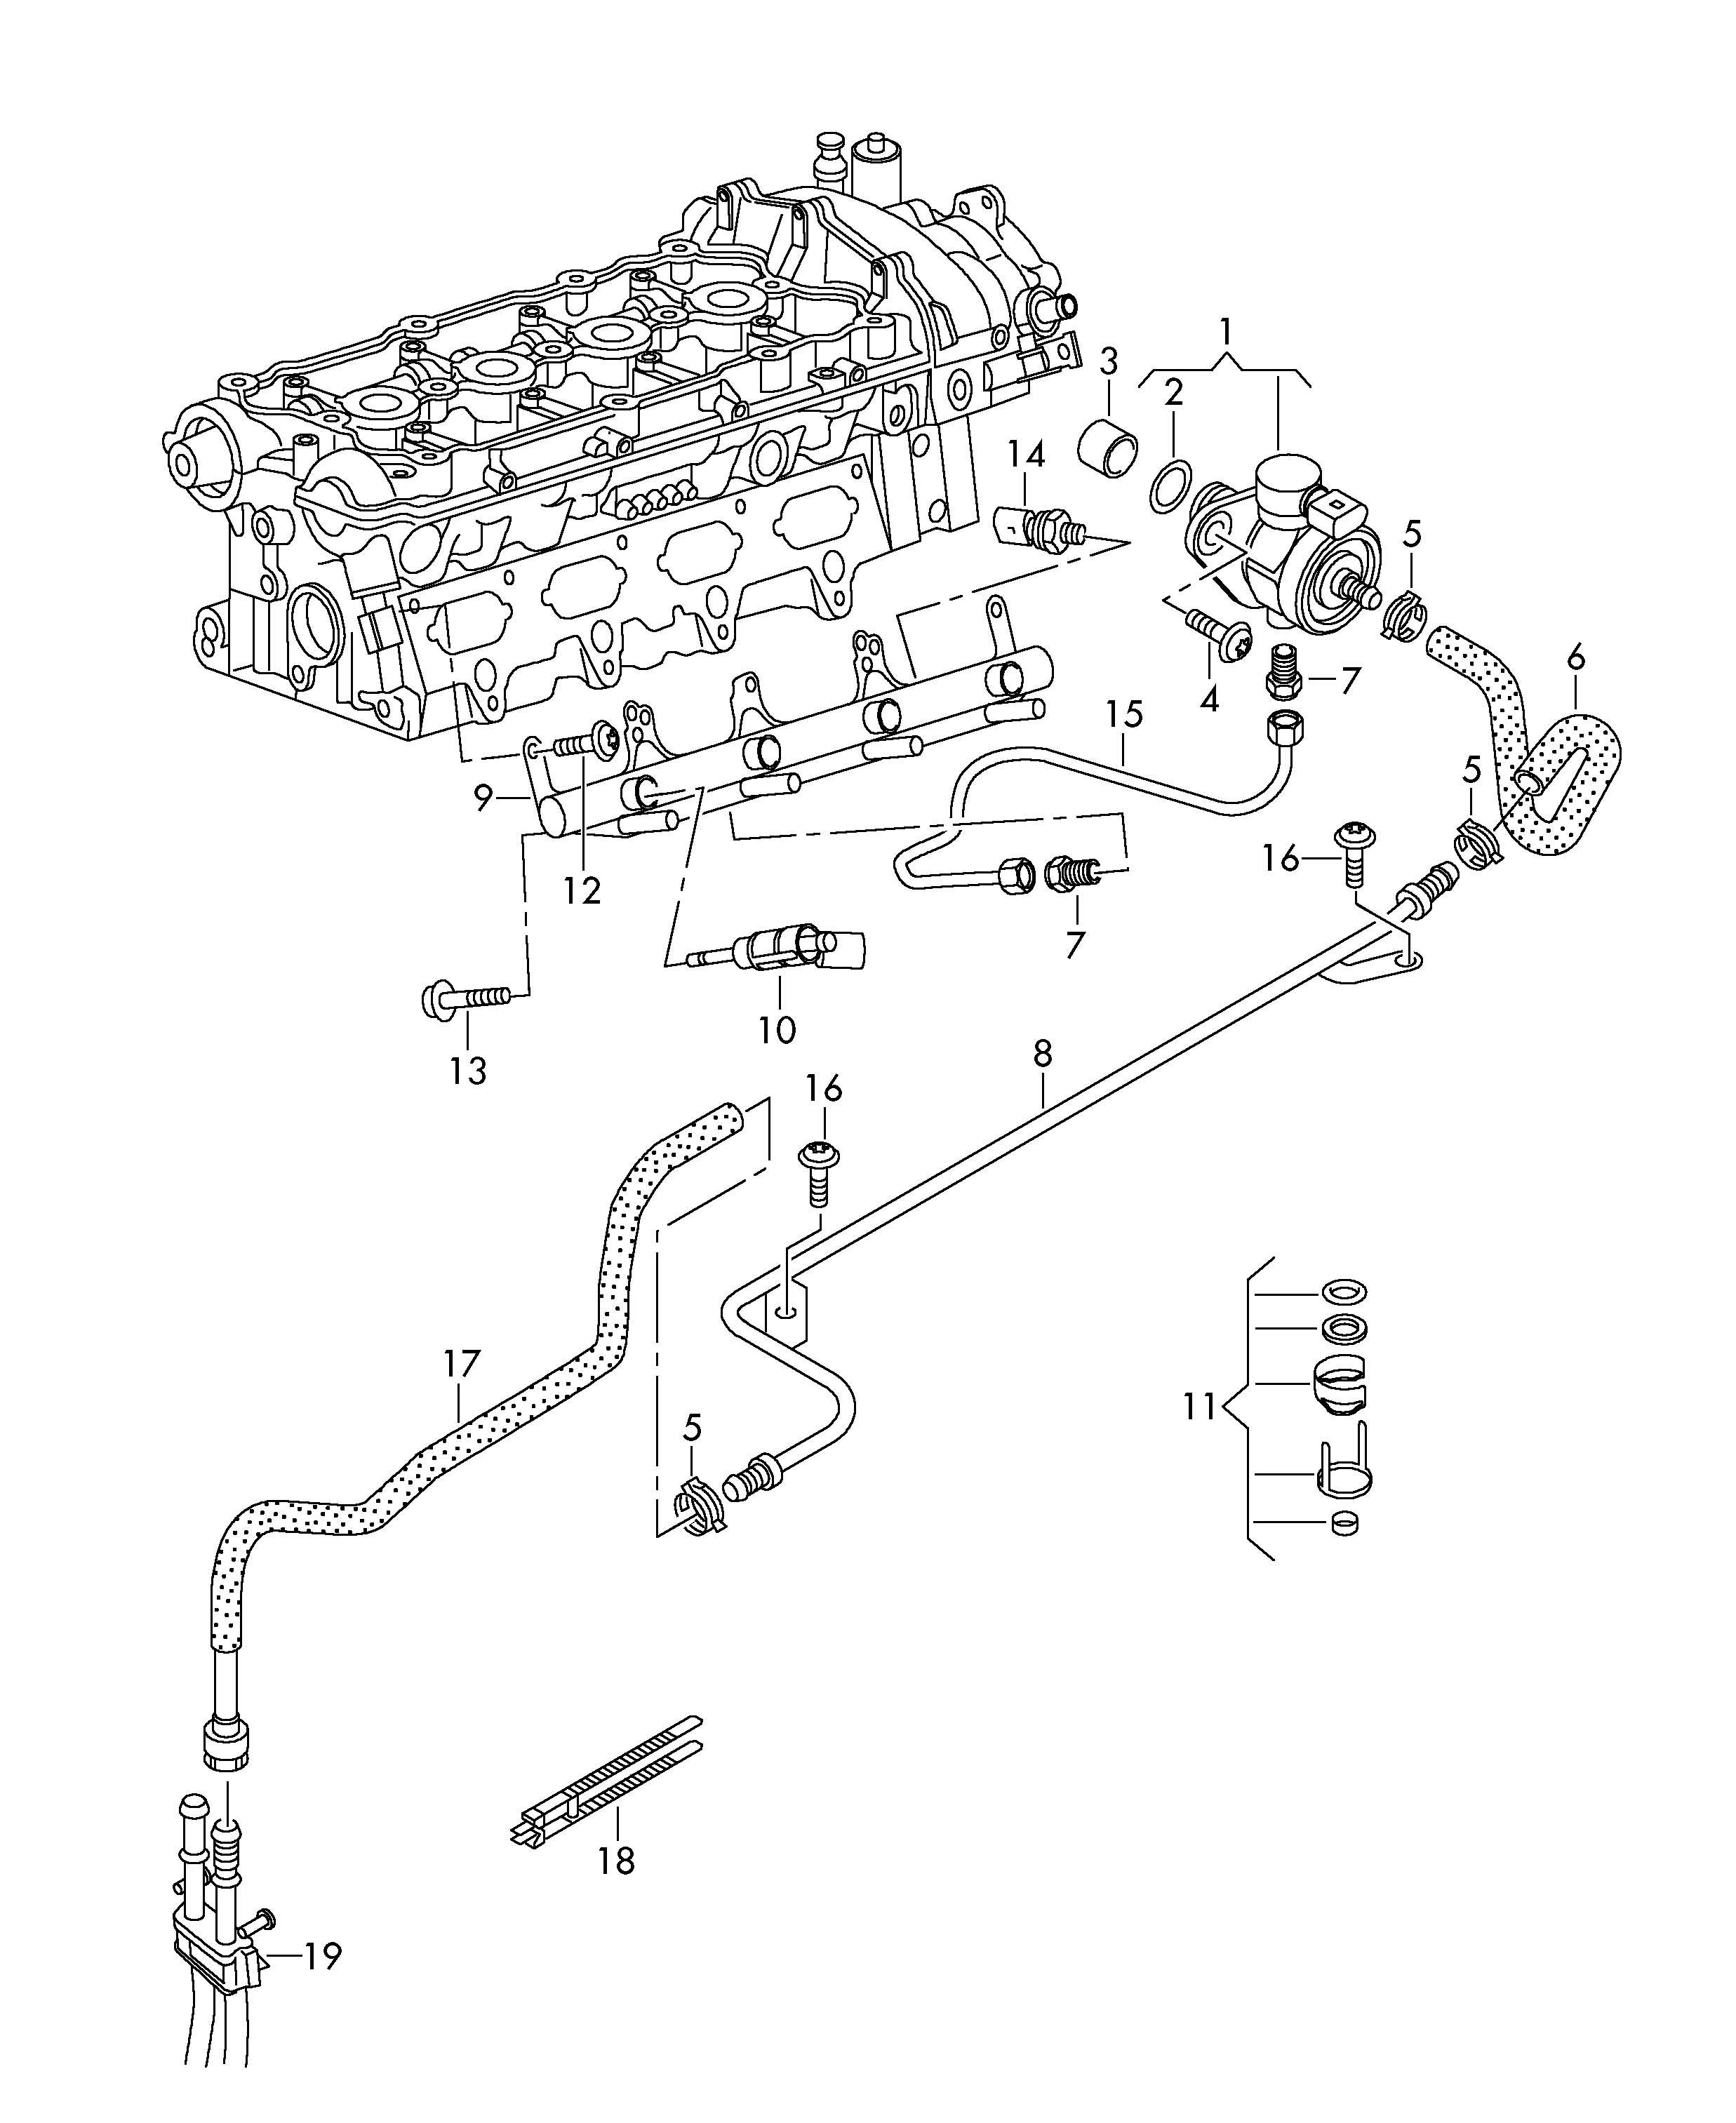 Volkswagen Tiguan Adapter Only For